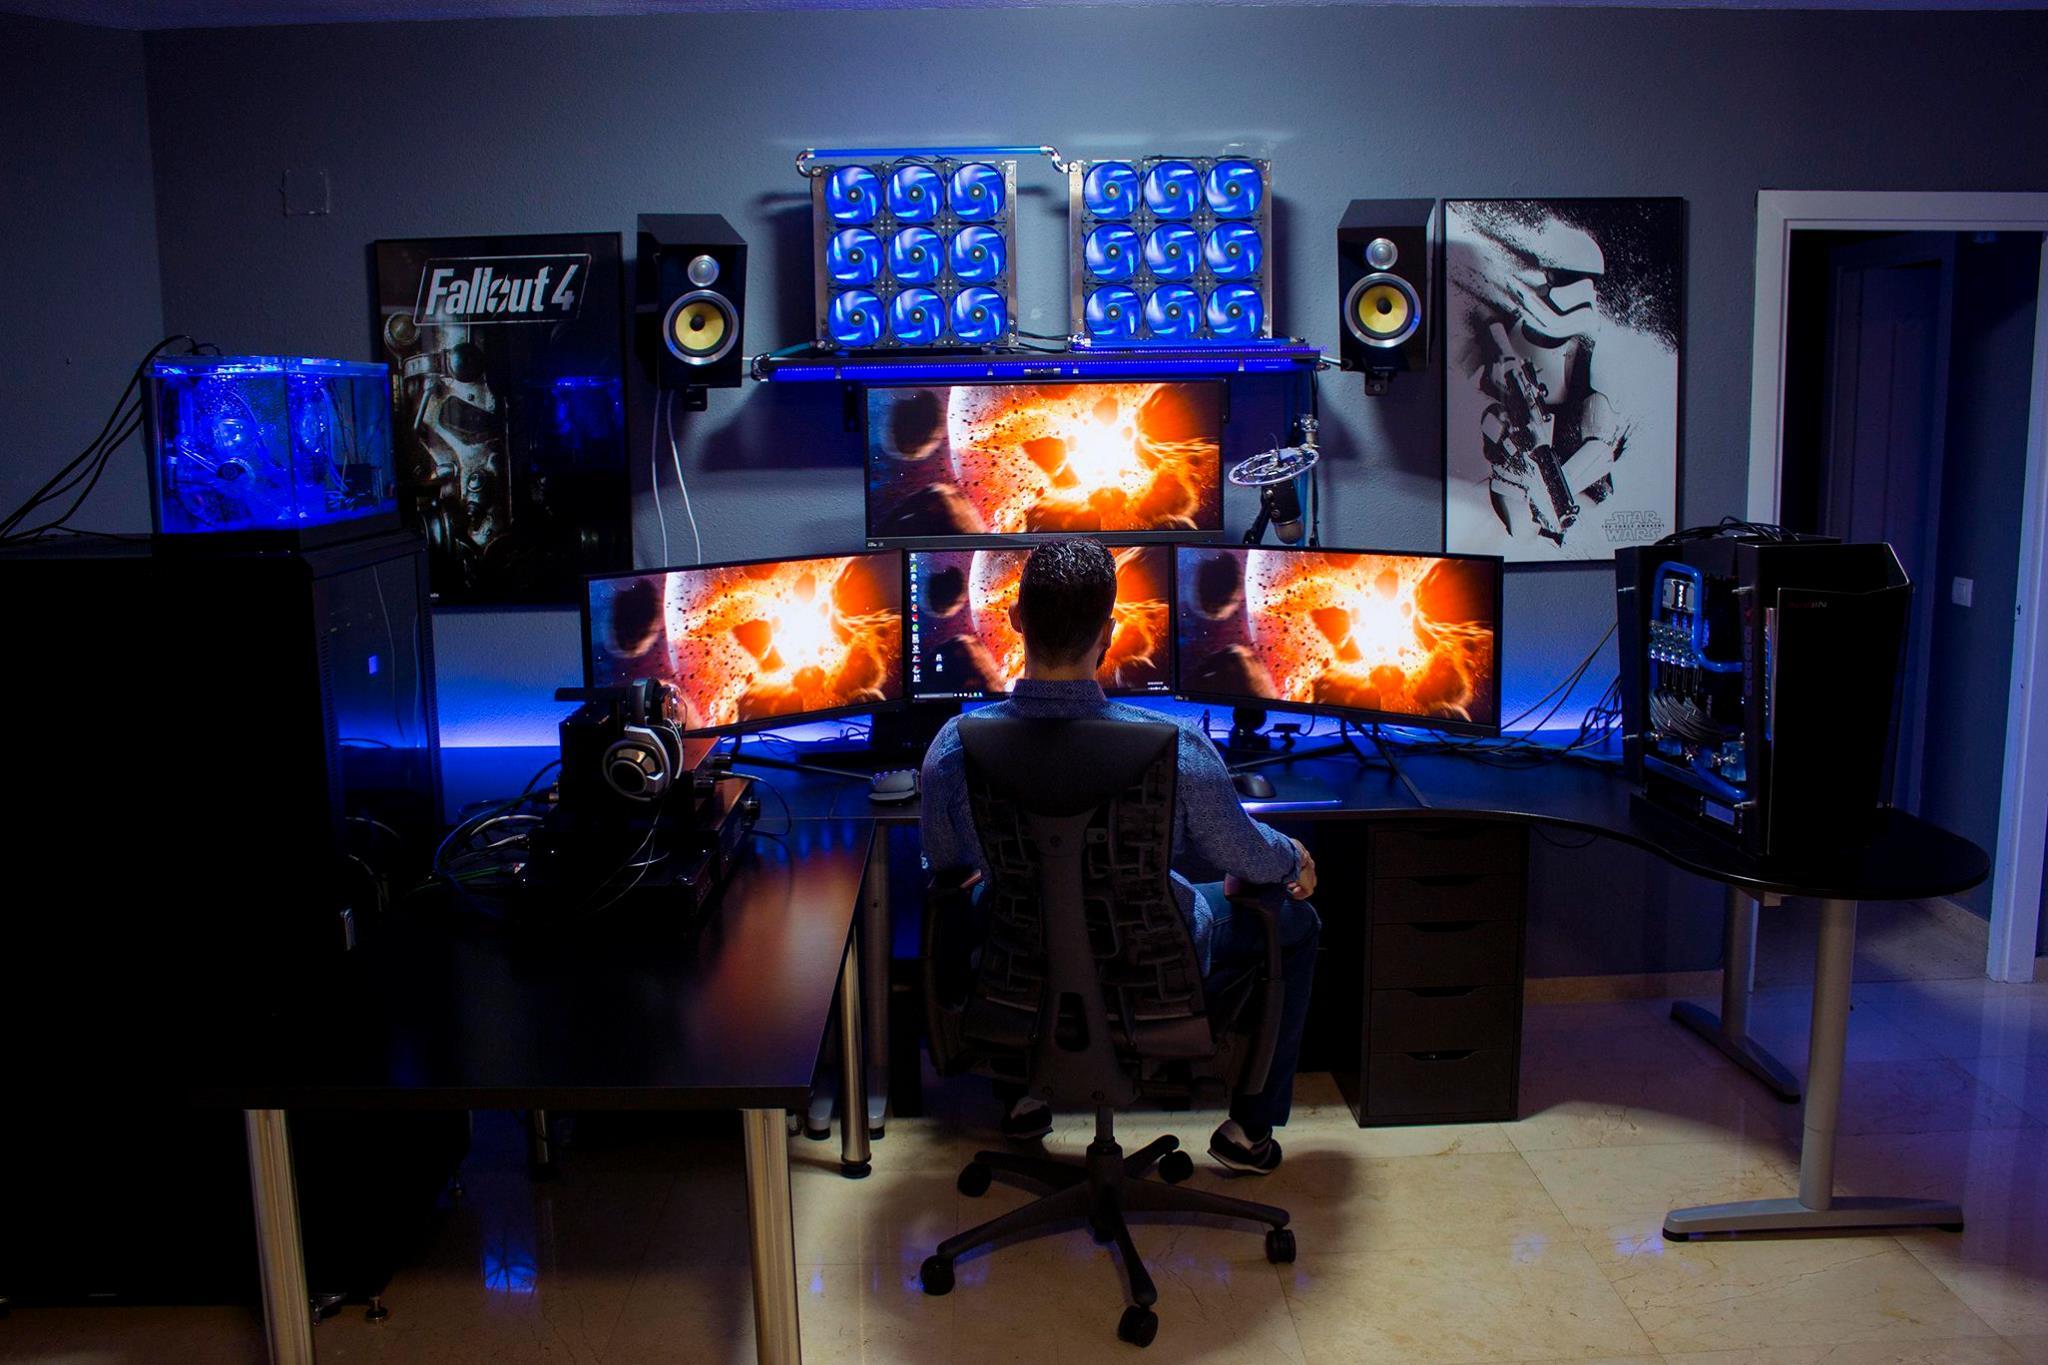 [MOD] The Command Center